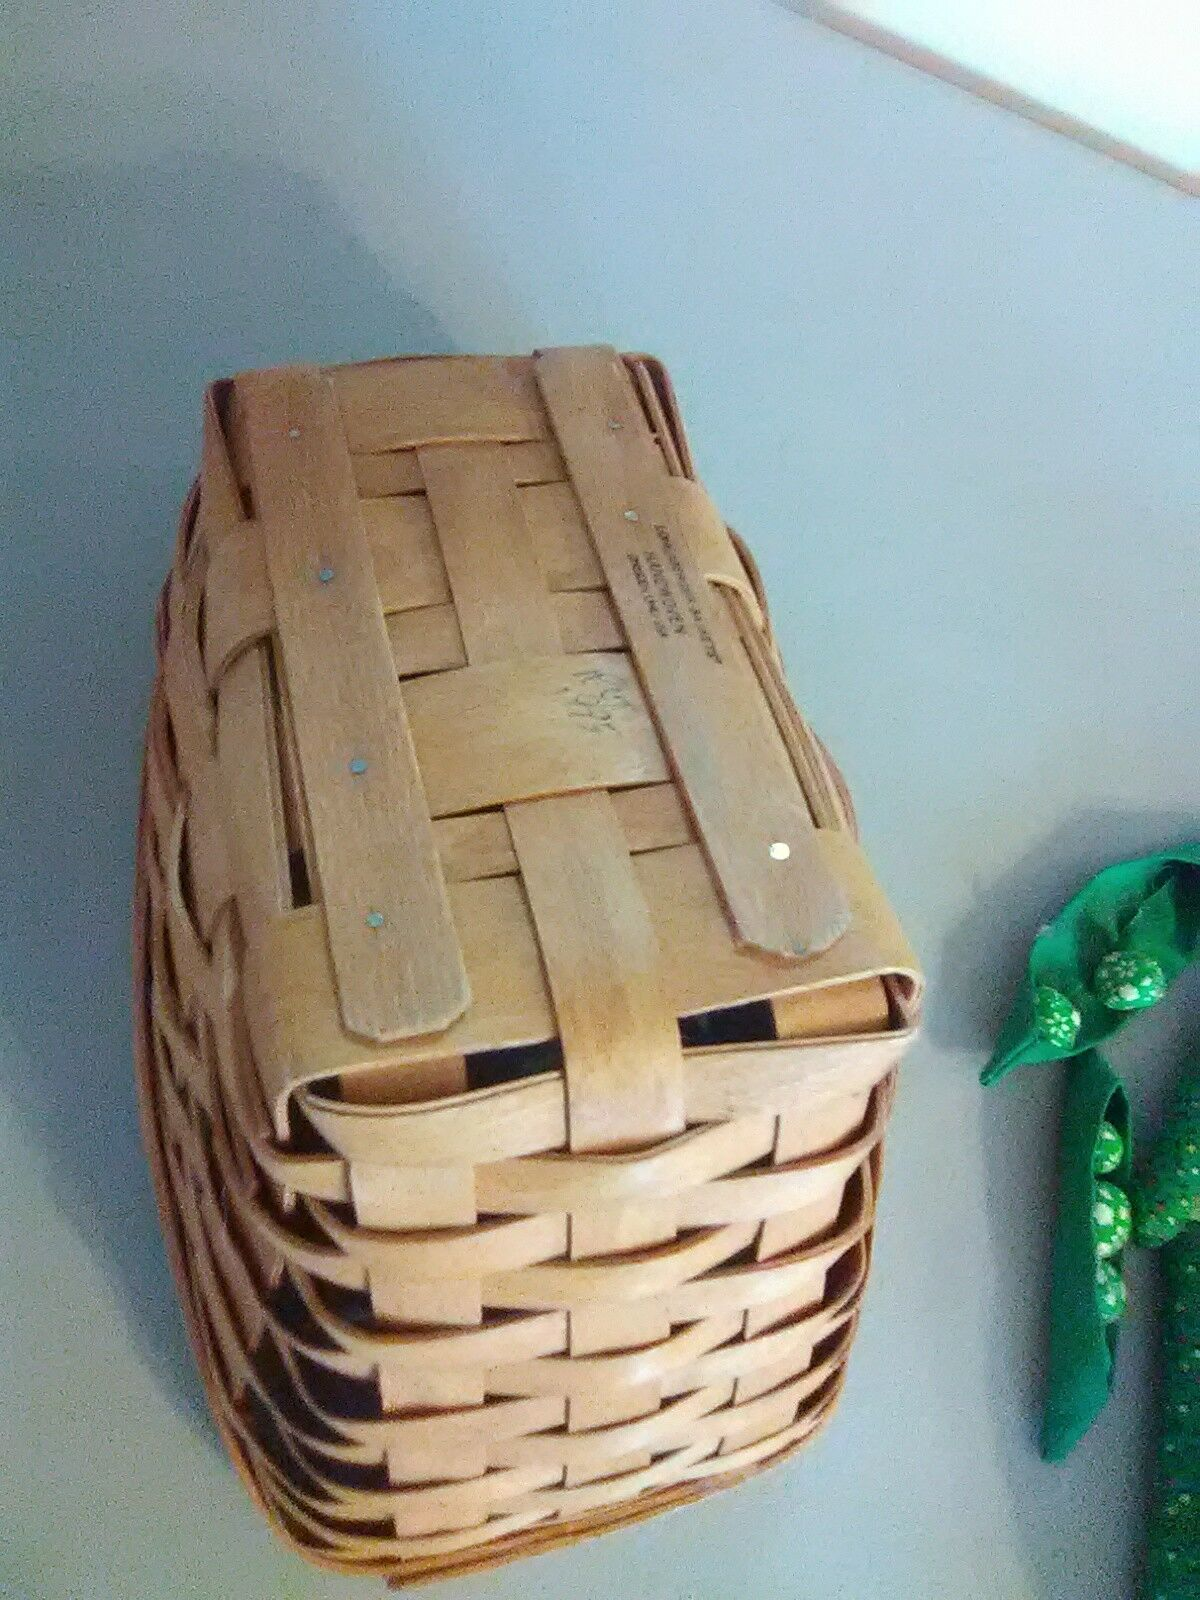 Longaberger Vegetable Sleigh Basket 1995  - Hand sewn vegetables image 8